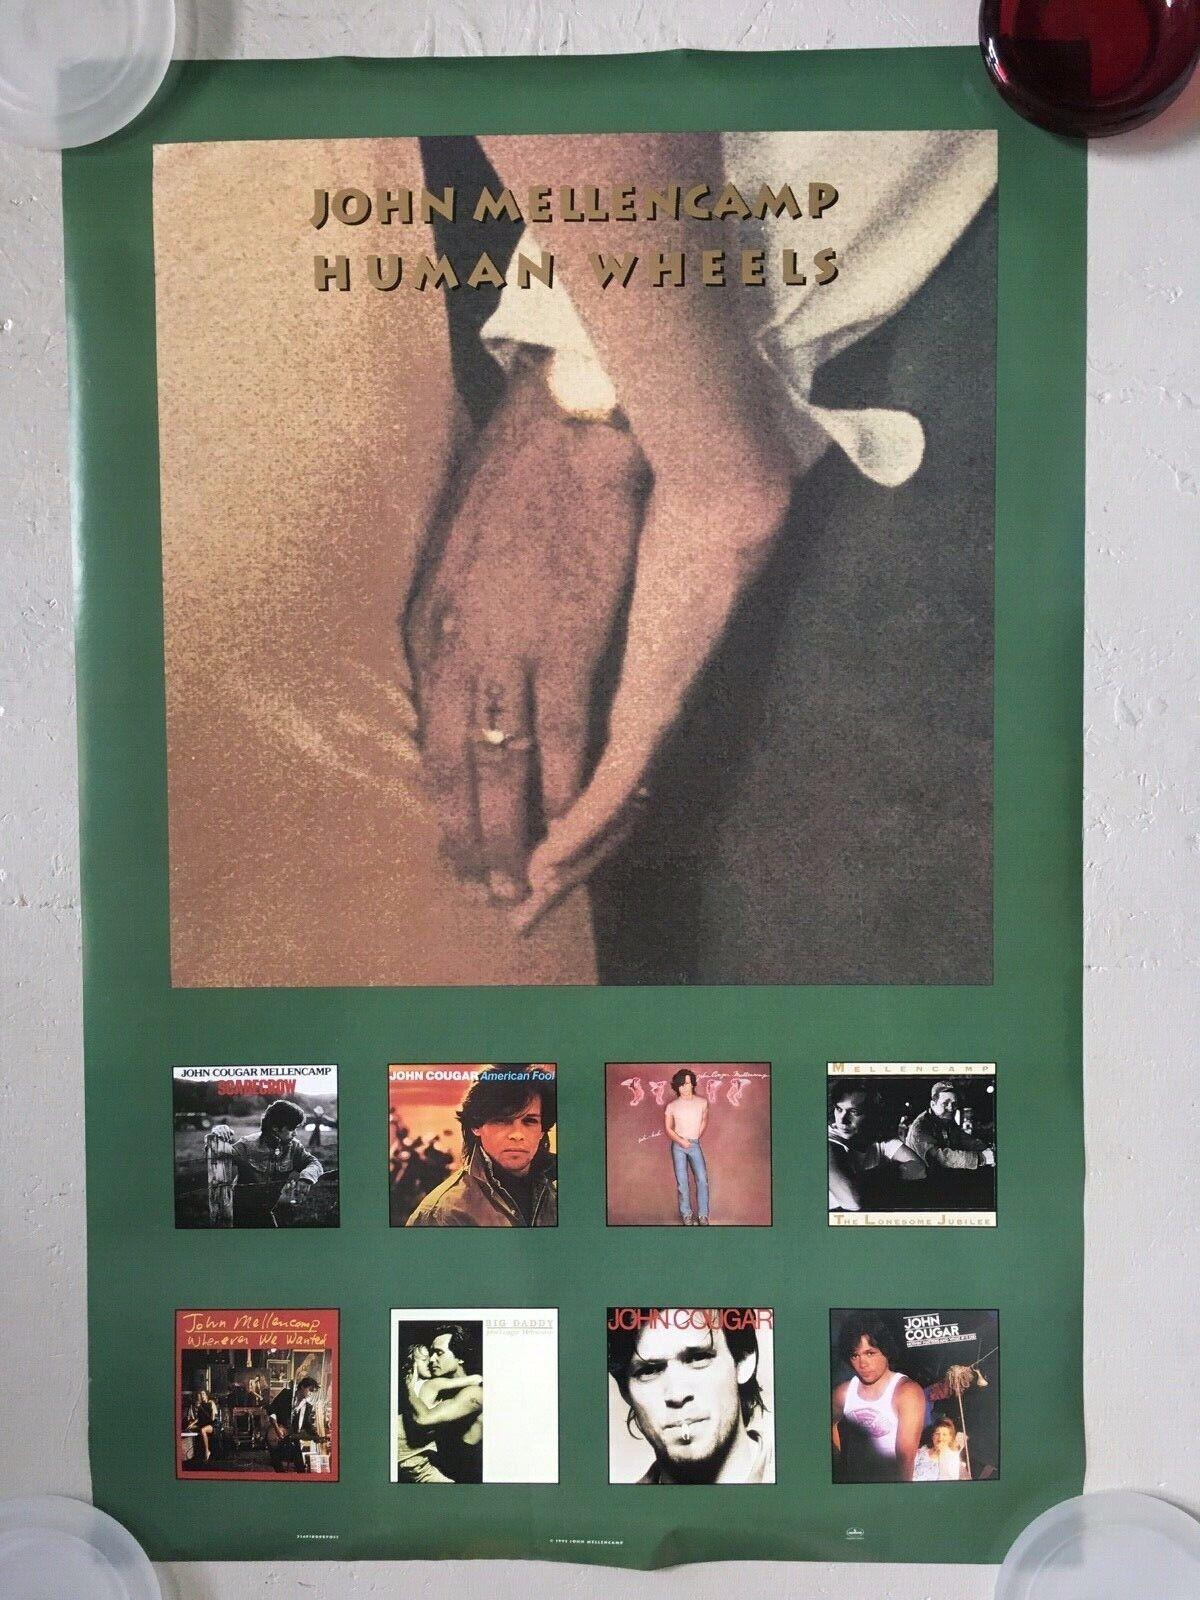 JOHN MELLENCAMP - Human Wheels - 1993 - 2x Sided Promo Poster - 24x36 - USA NEW - $7.99